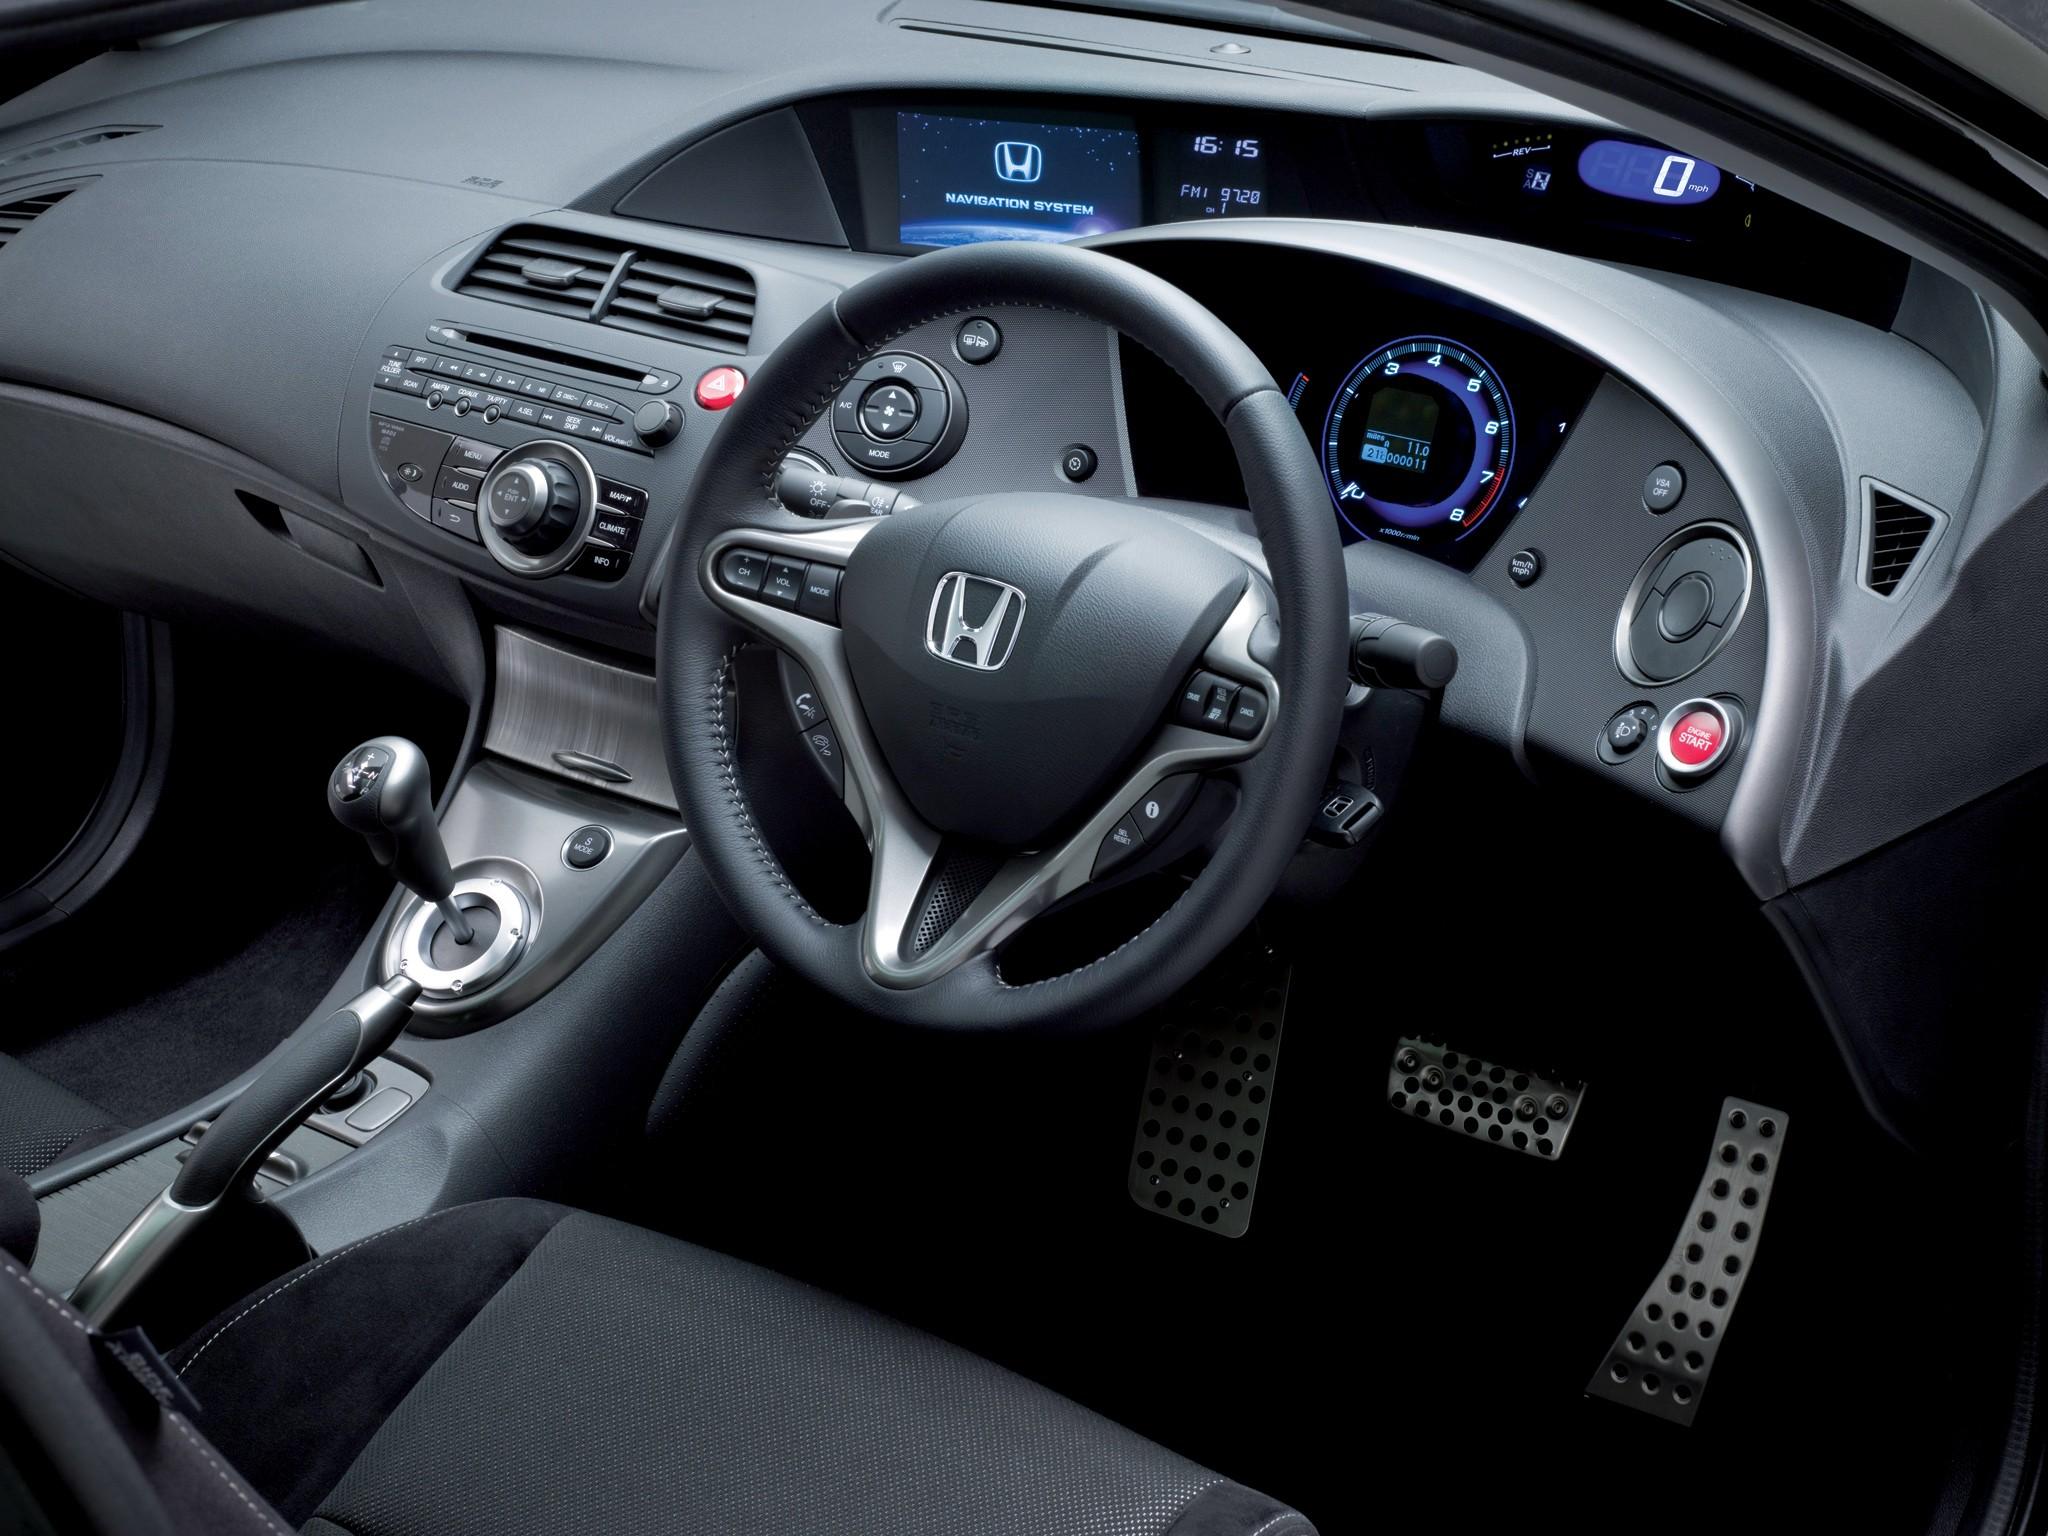 Kelebihan Kekurangan Honda Civic Type S 2008 Murah Berkualitas